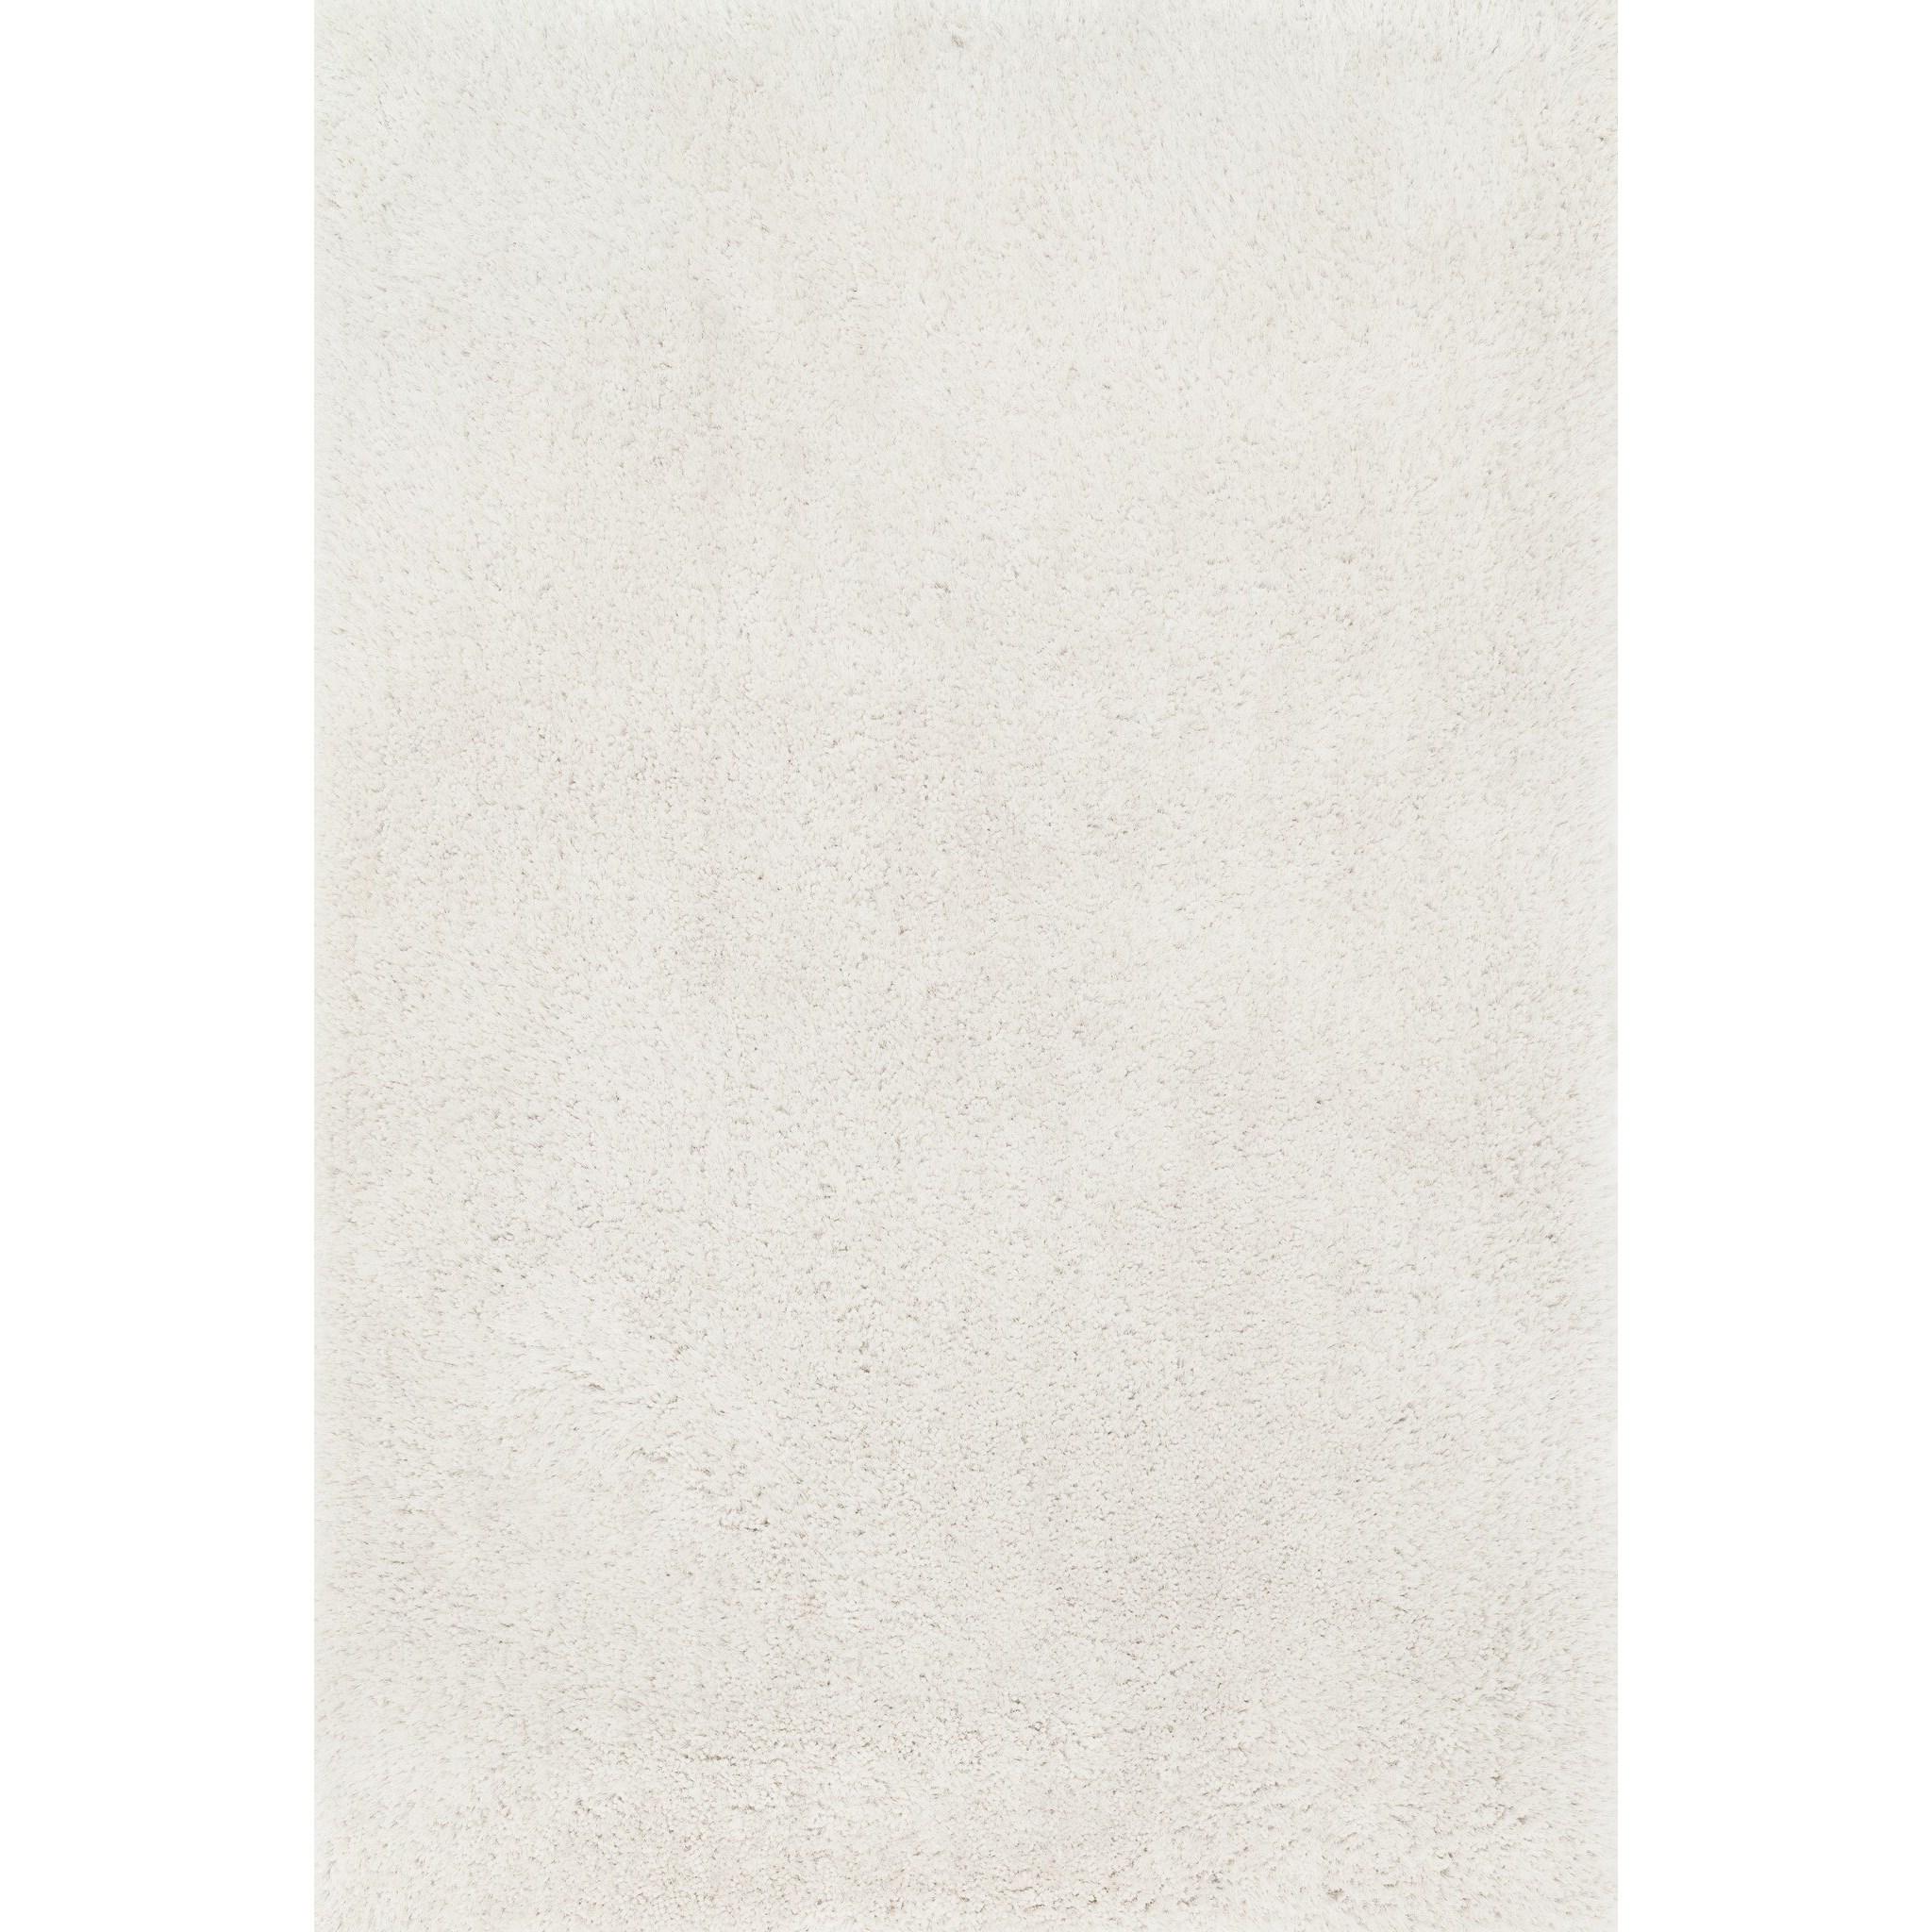 "Loloi Rugs Fresco Shag 7'-9"" x 9'-9"" Area Rug - Item Number: FRESFG-01IV007999"